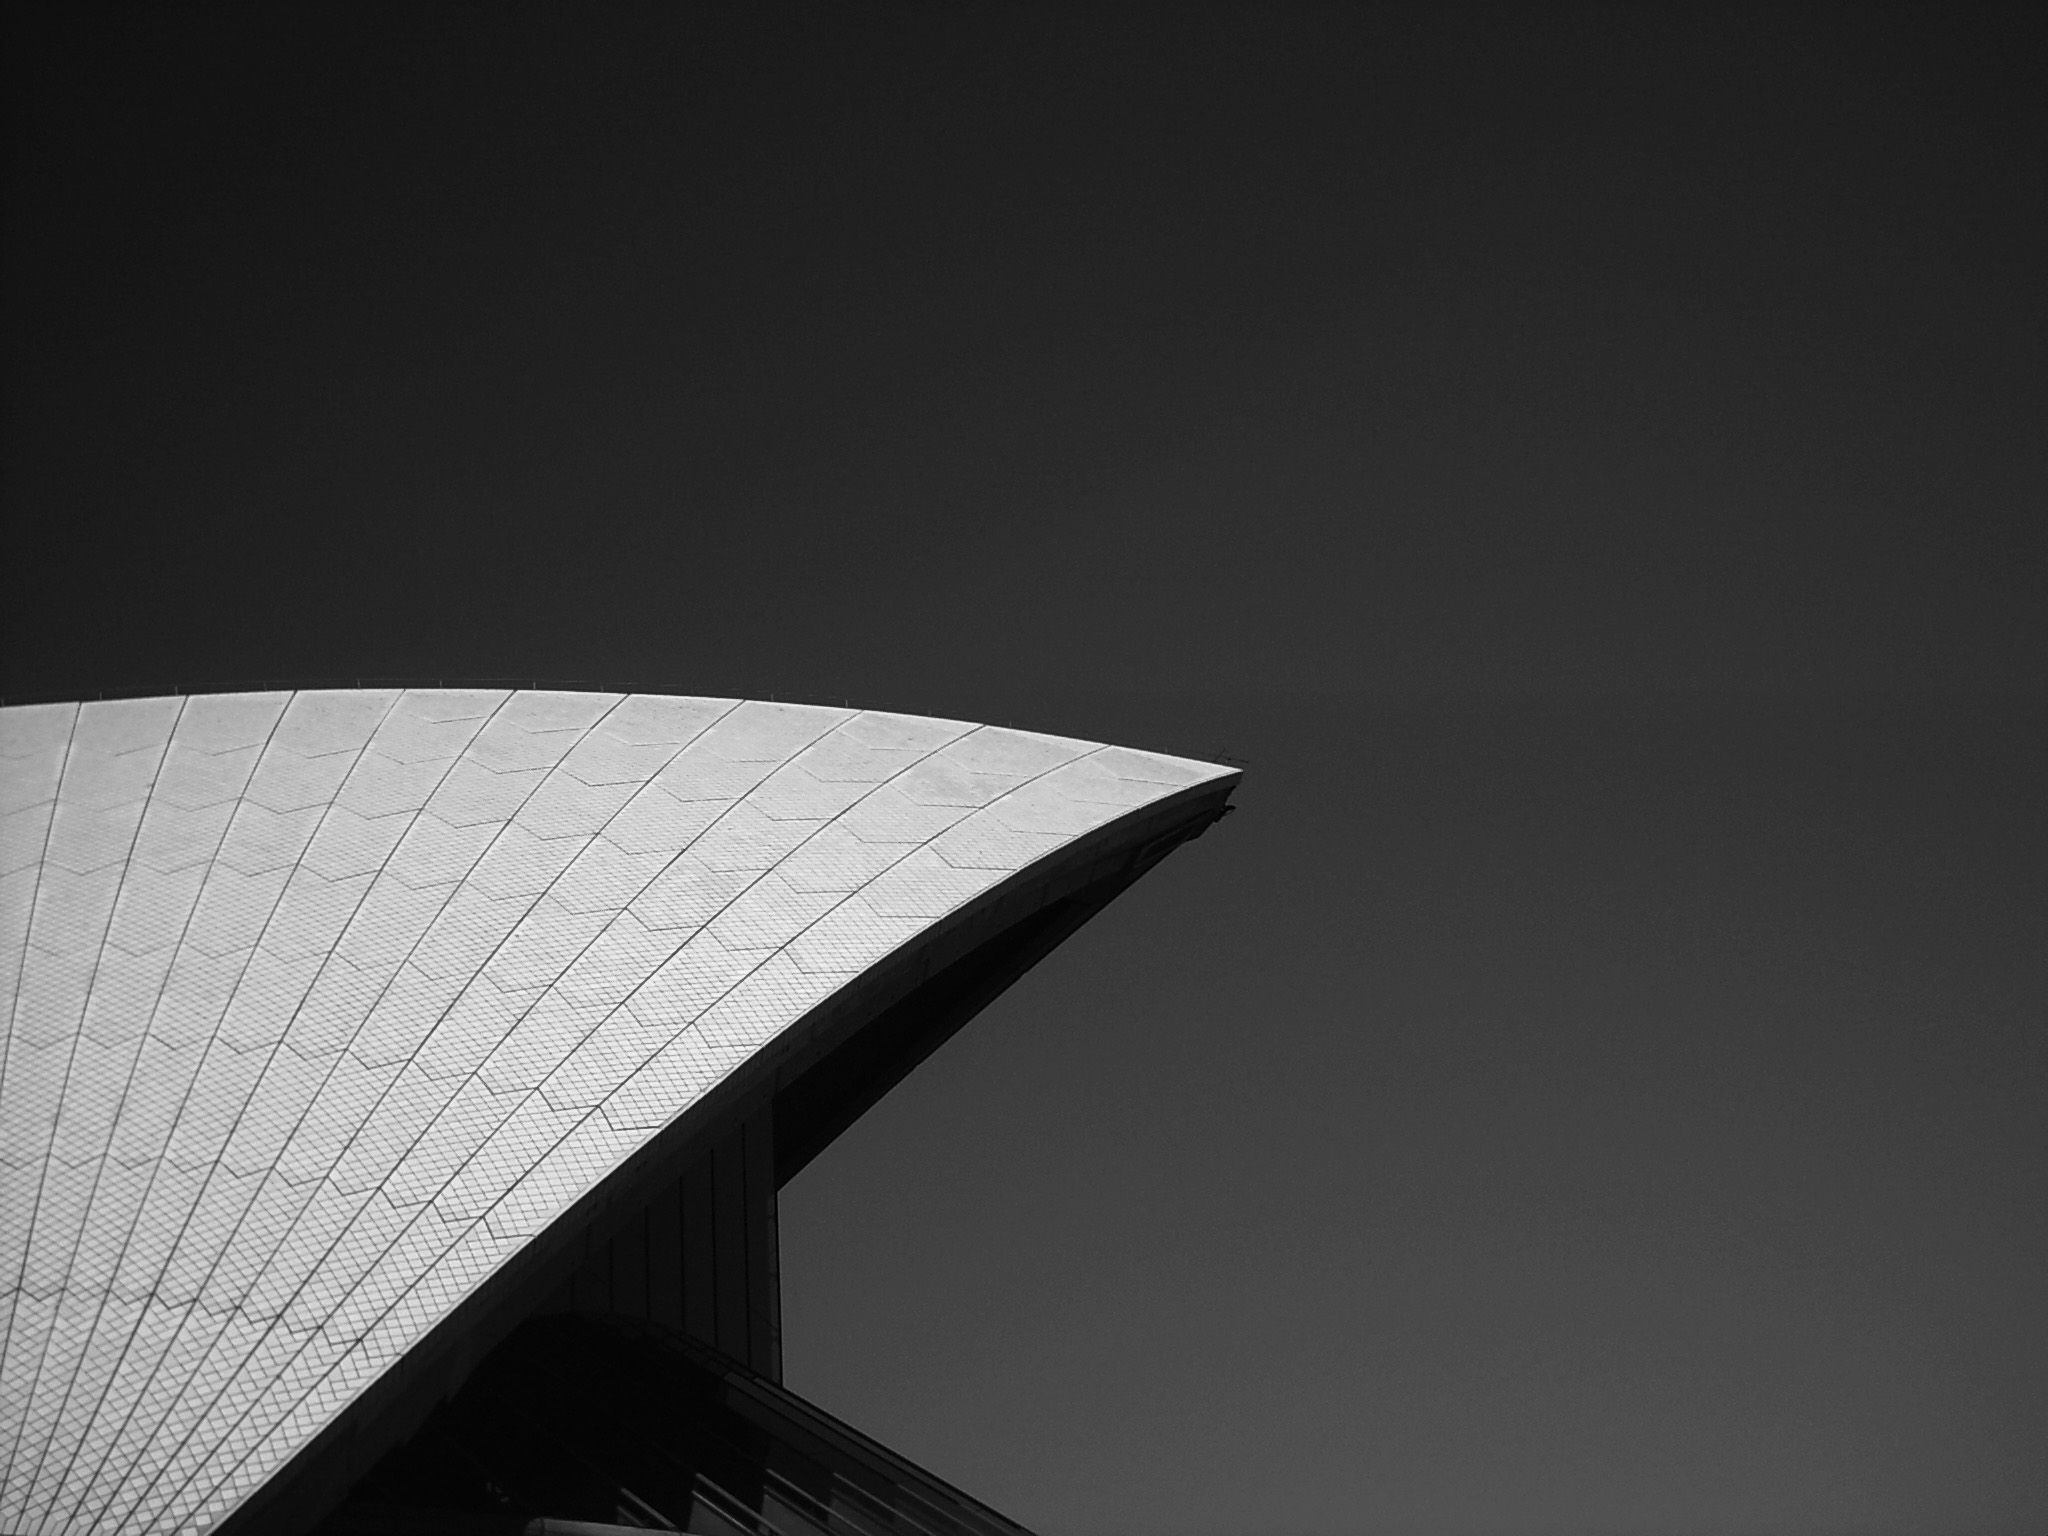 Joel tjintjelaar google search minimalist photography architectural photography long exposure fine art